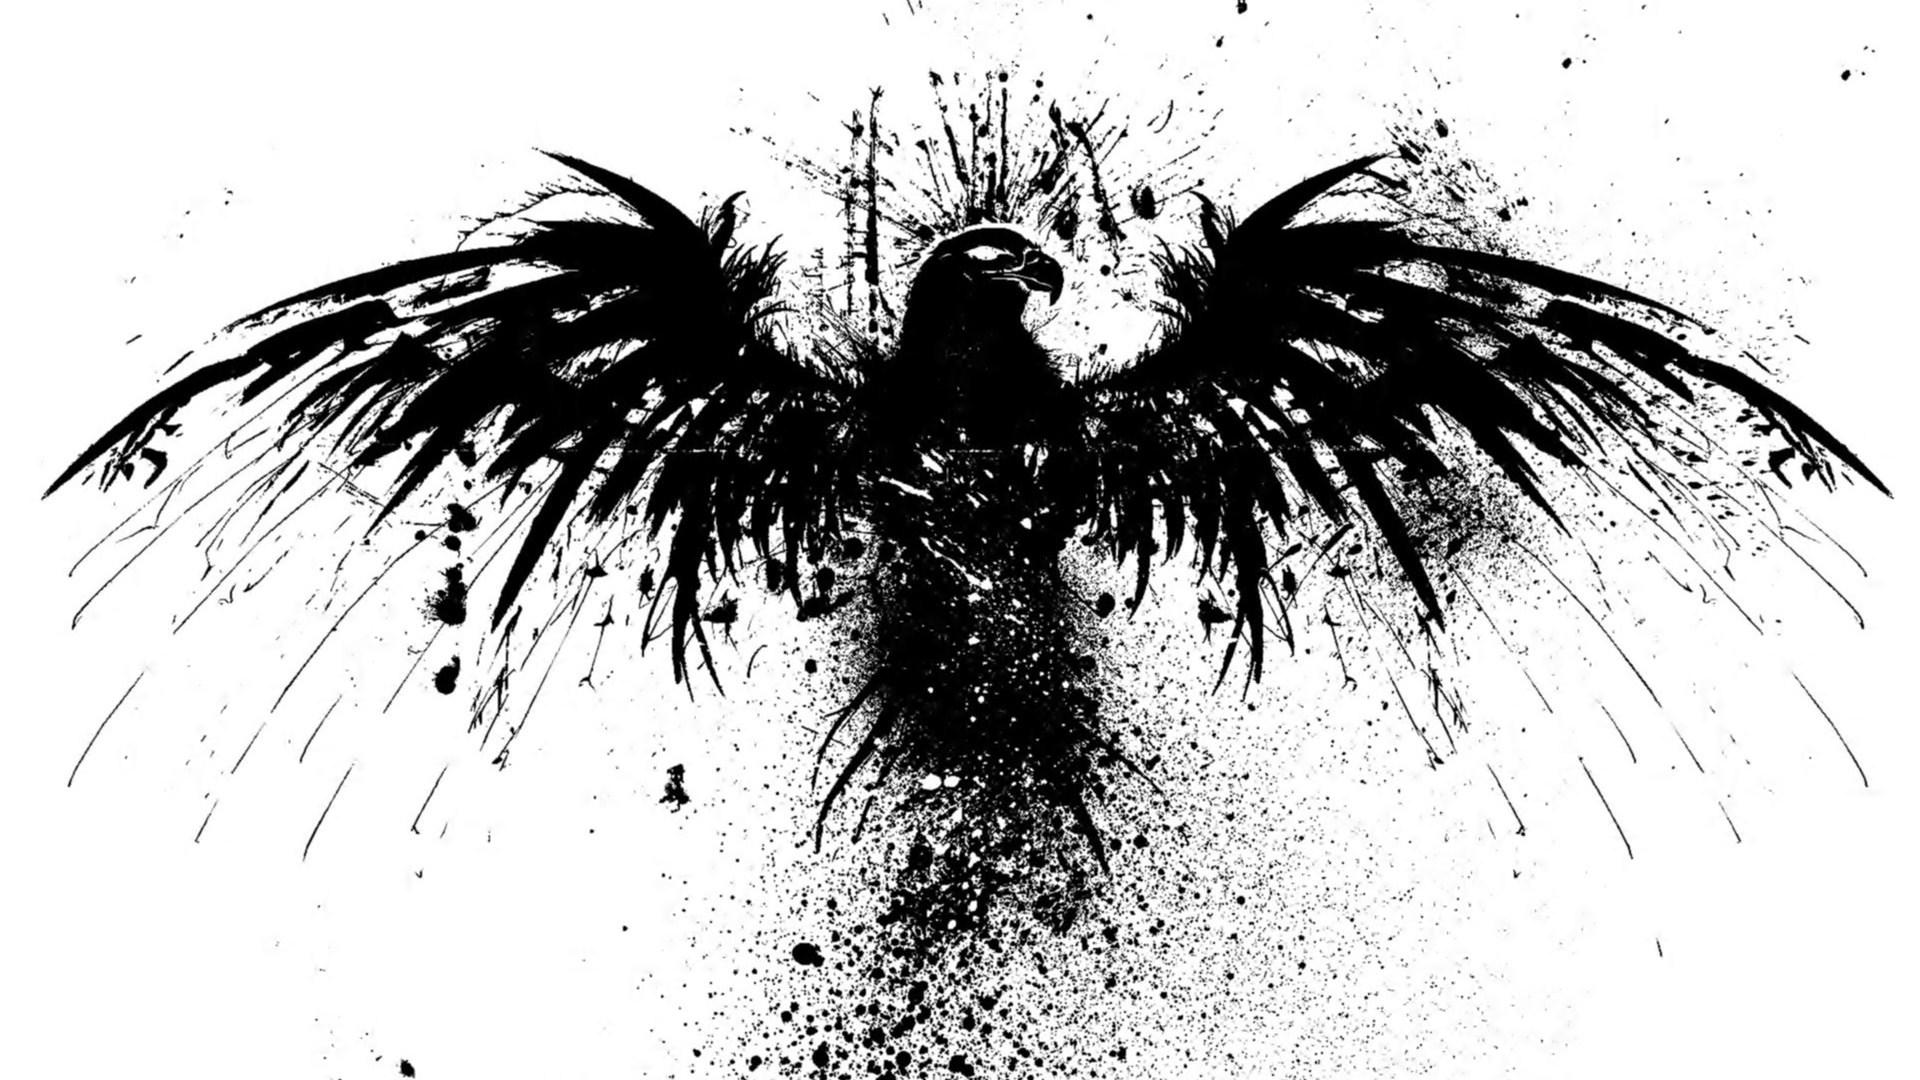 Black And White Swans In Love Wallpaper Black Raven Bird Wallpapers